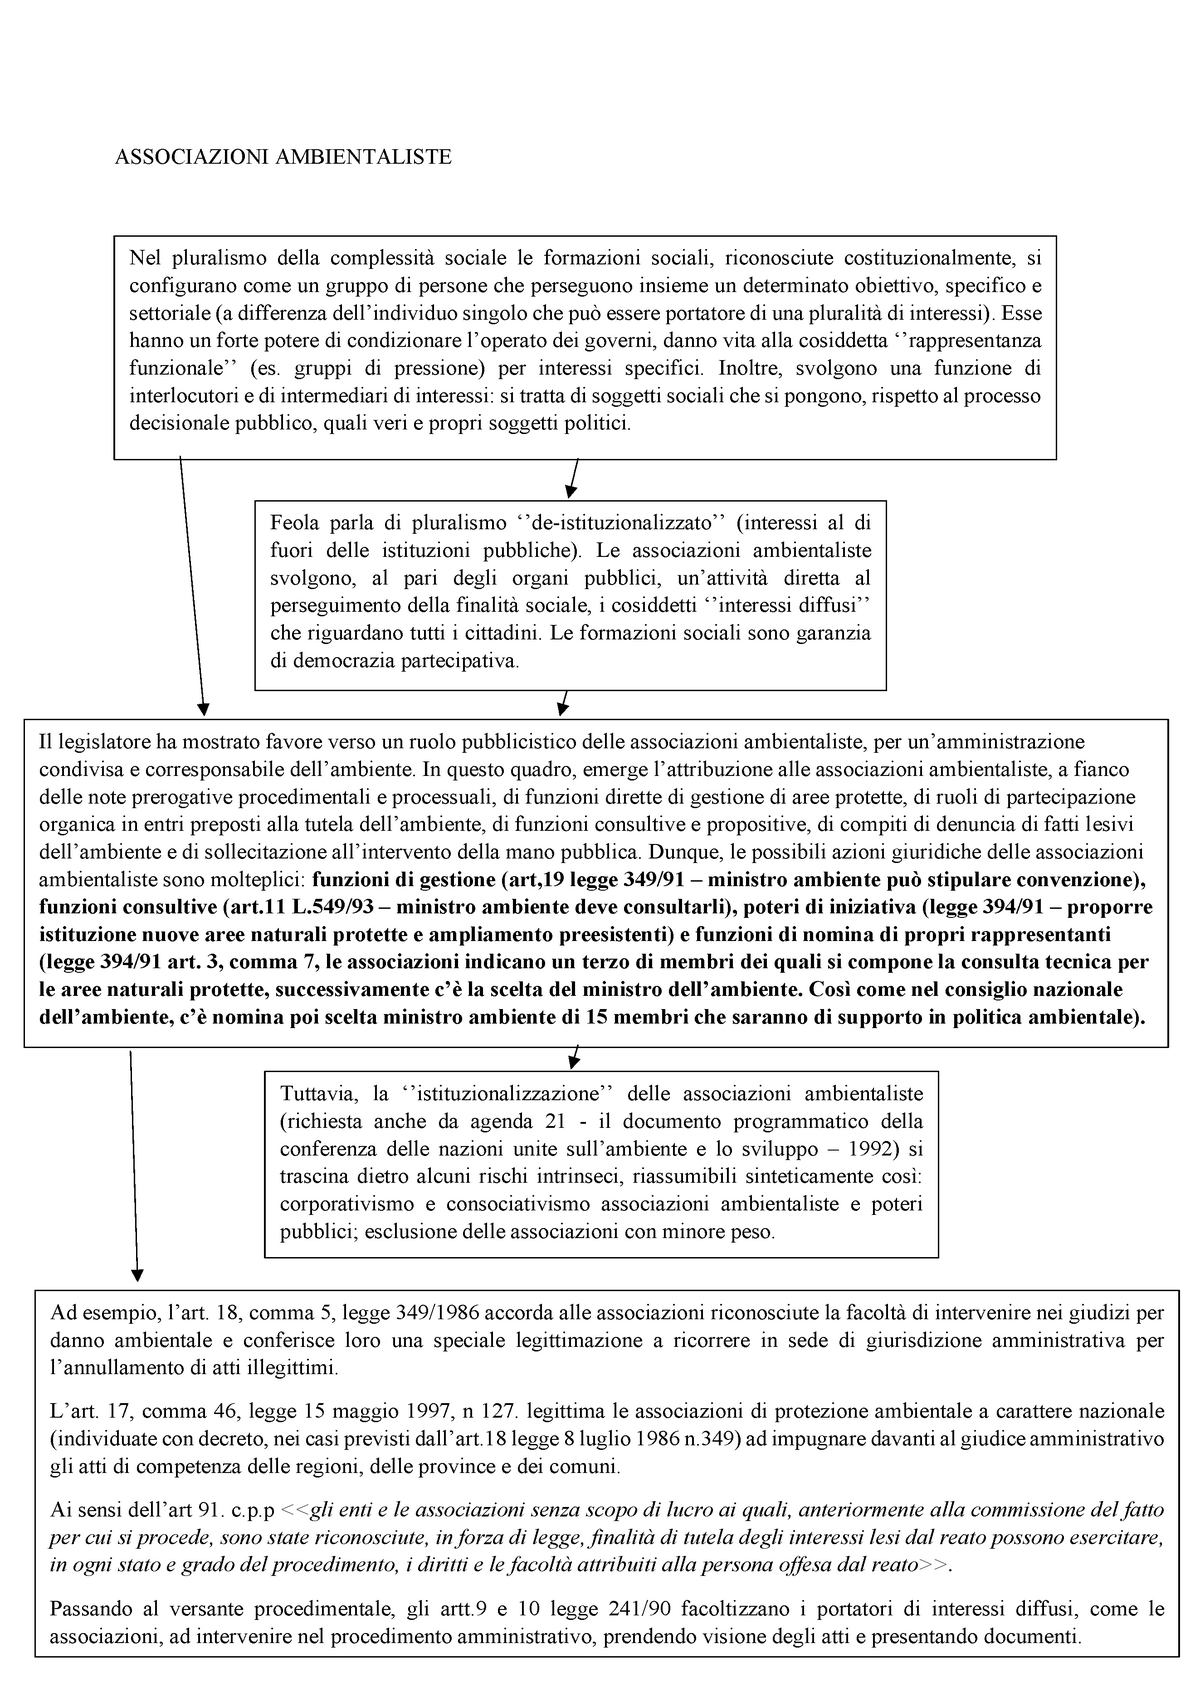 Associazioni ambientaliste 2 - StuDocu